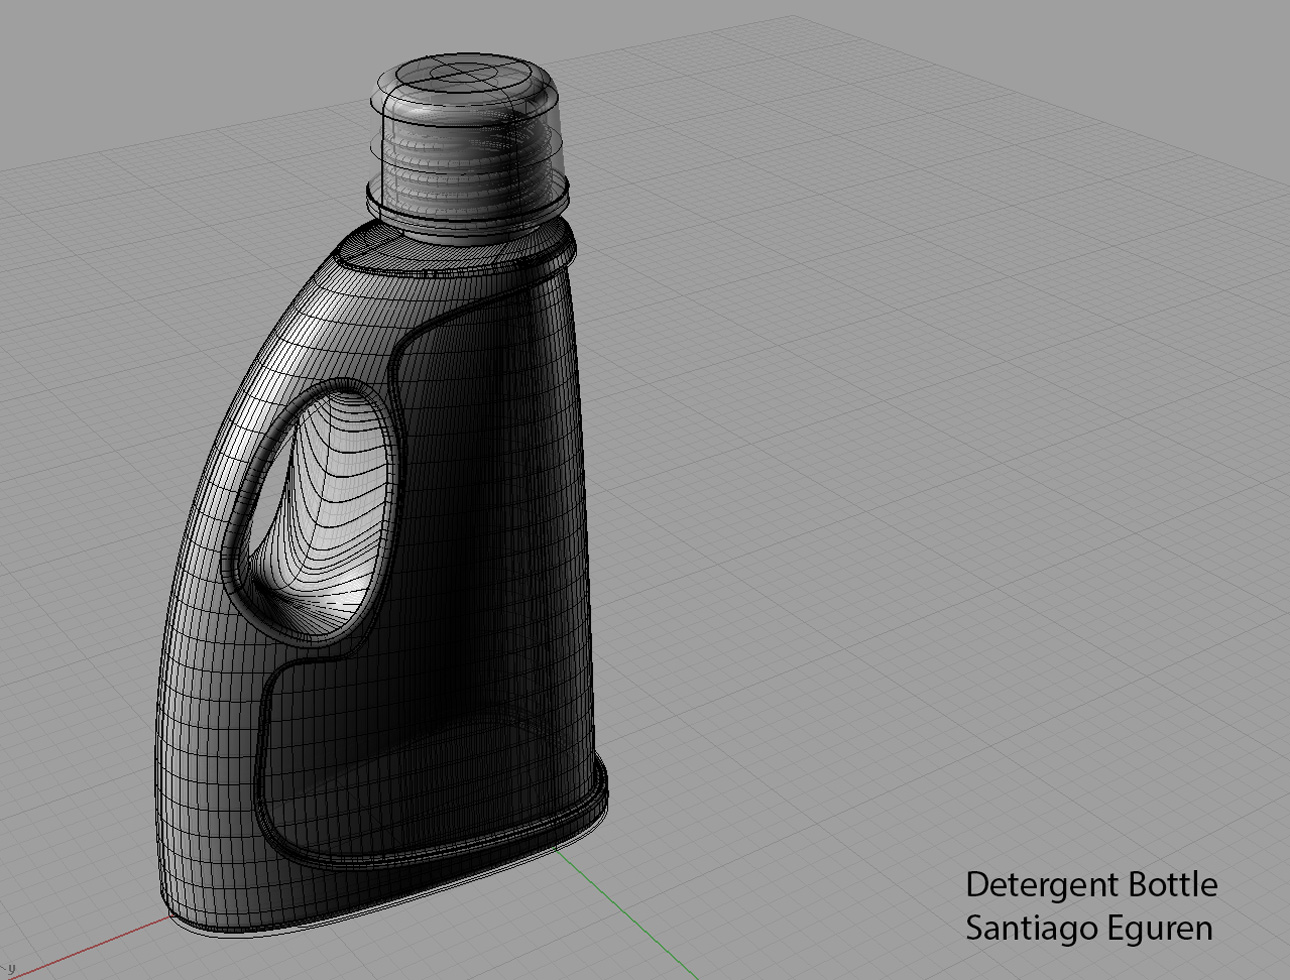 ELDS 205: Computer Aided Product Design: Santiago Eguren